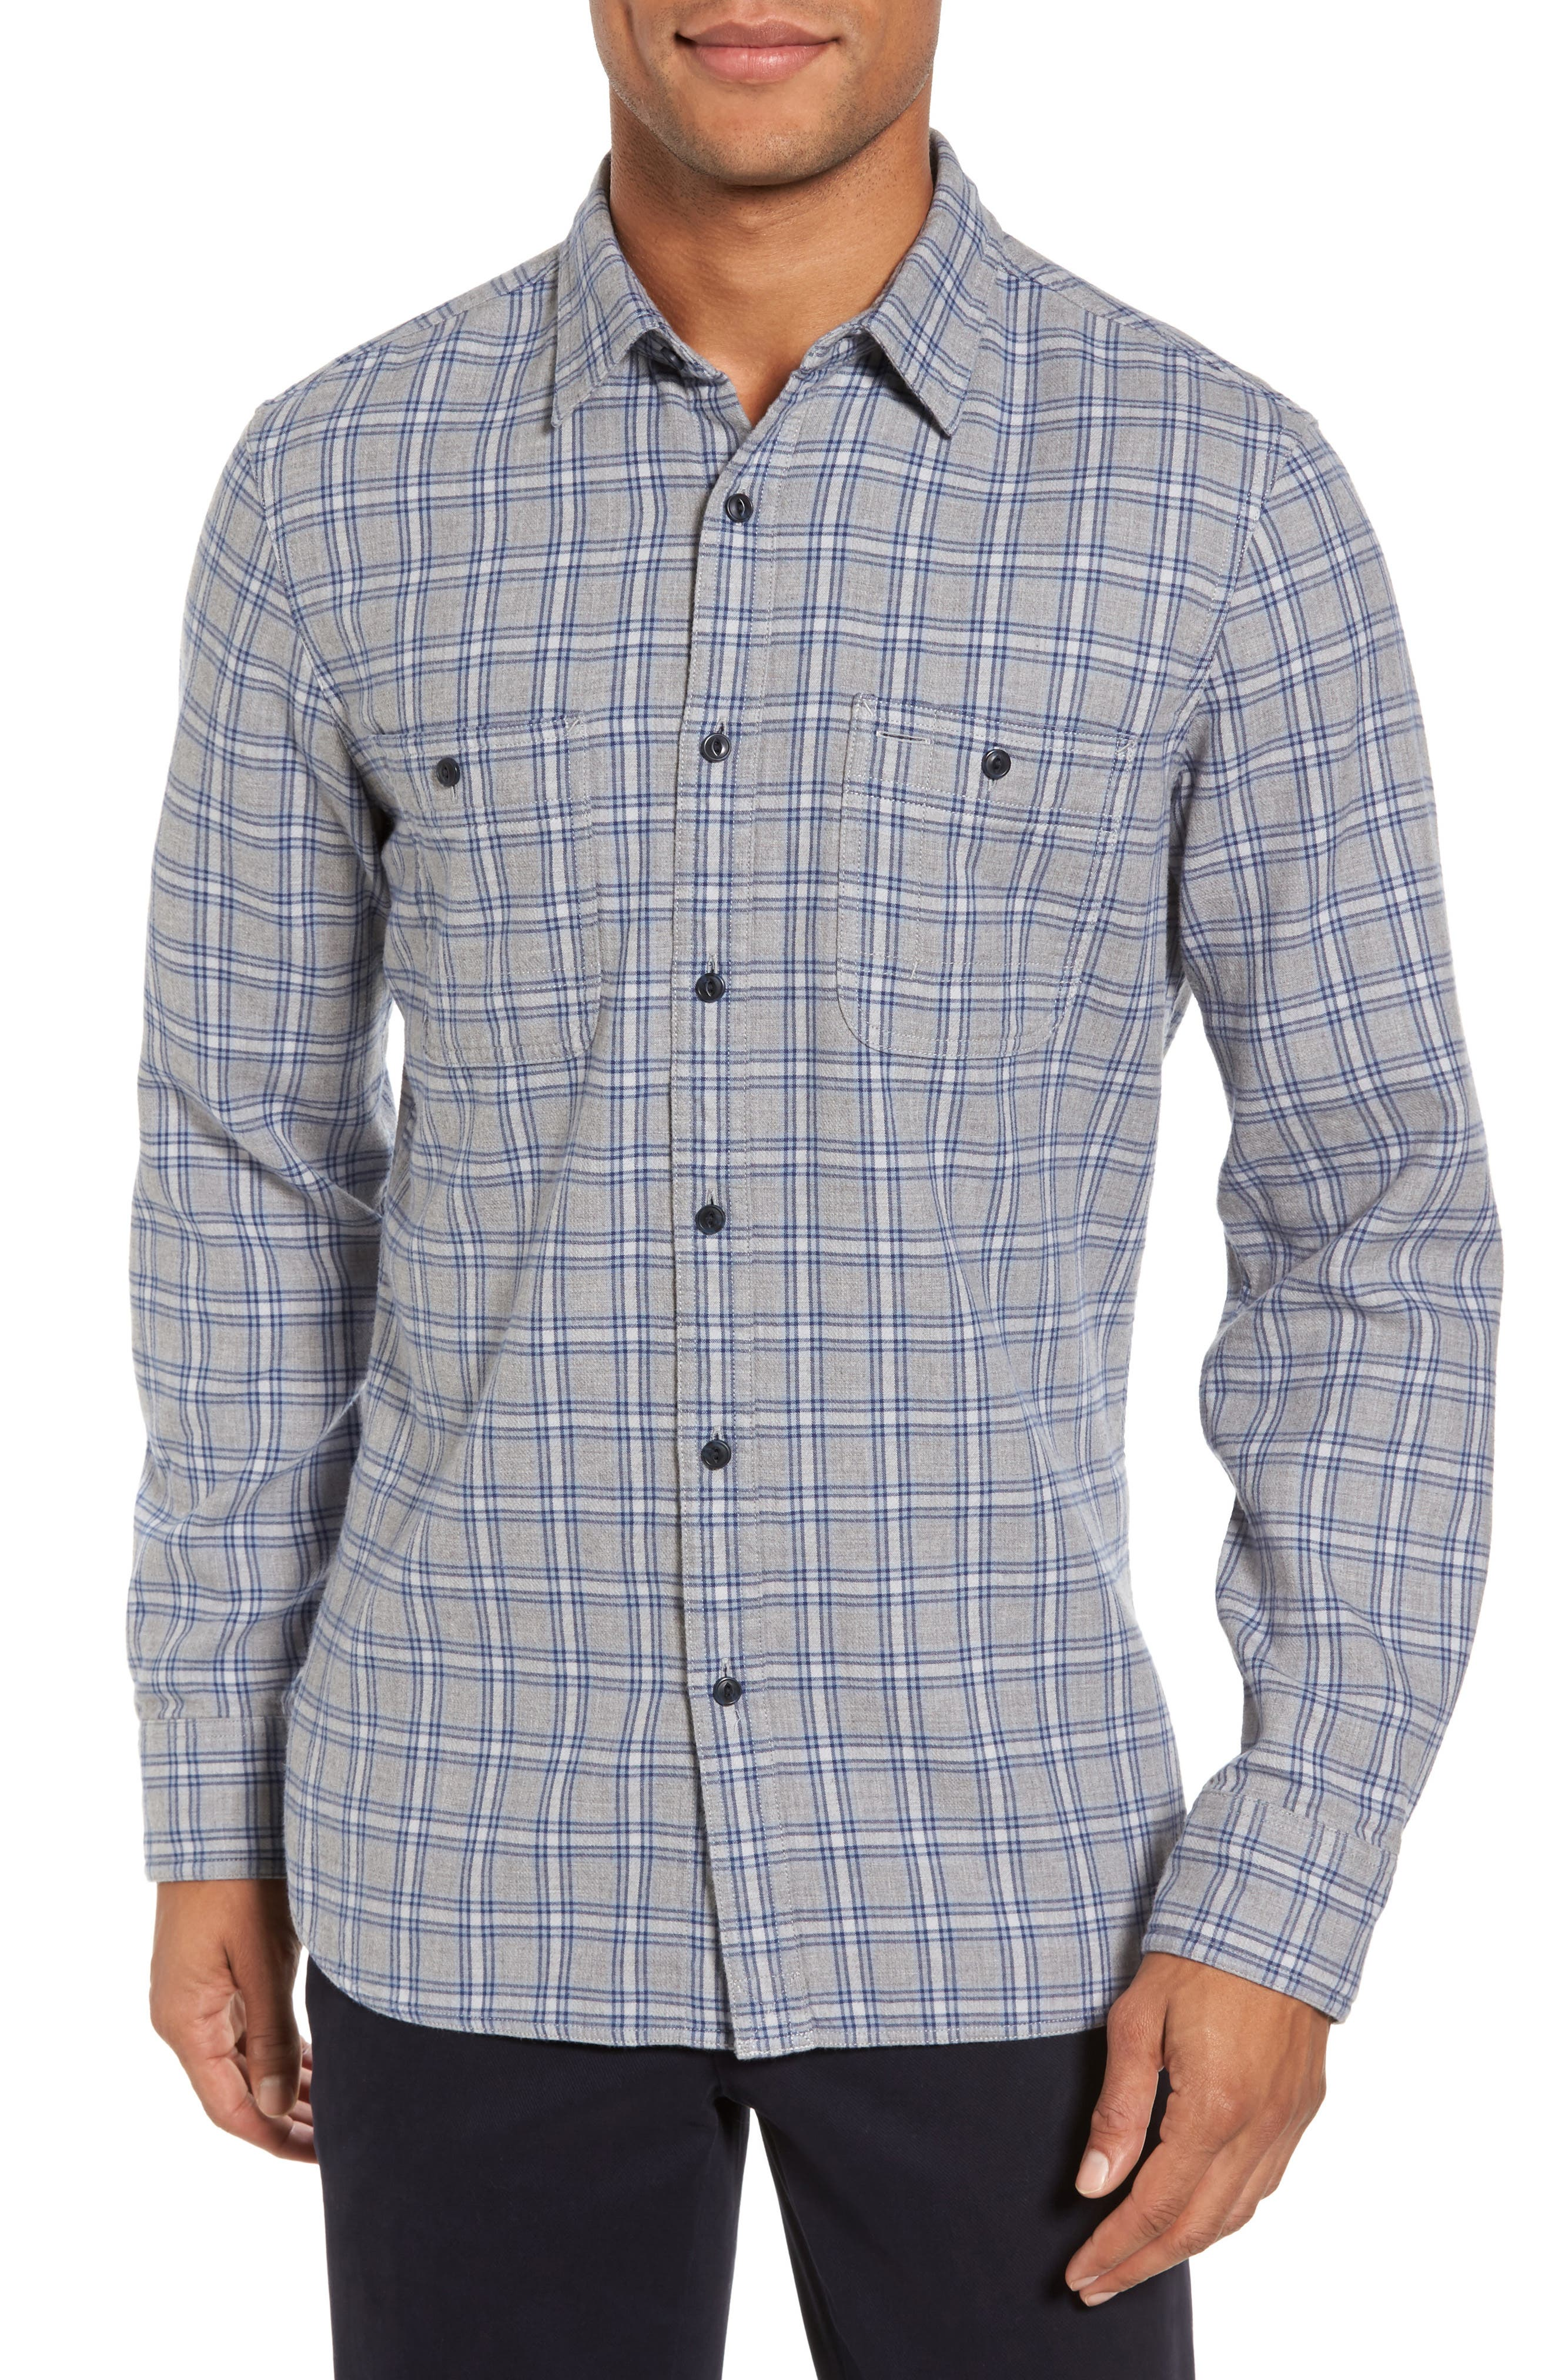 Workwear Duofold Check Sport Shirt,                         Main,                         color, Navy Iris Grey Plaid Duofold